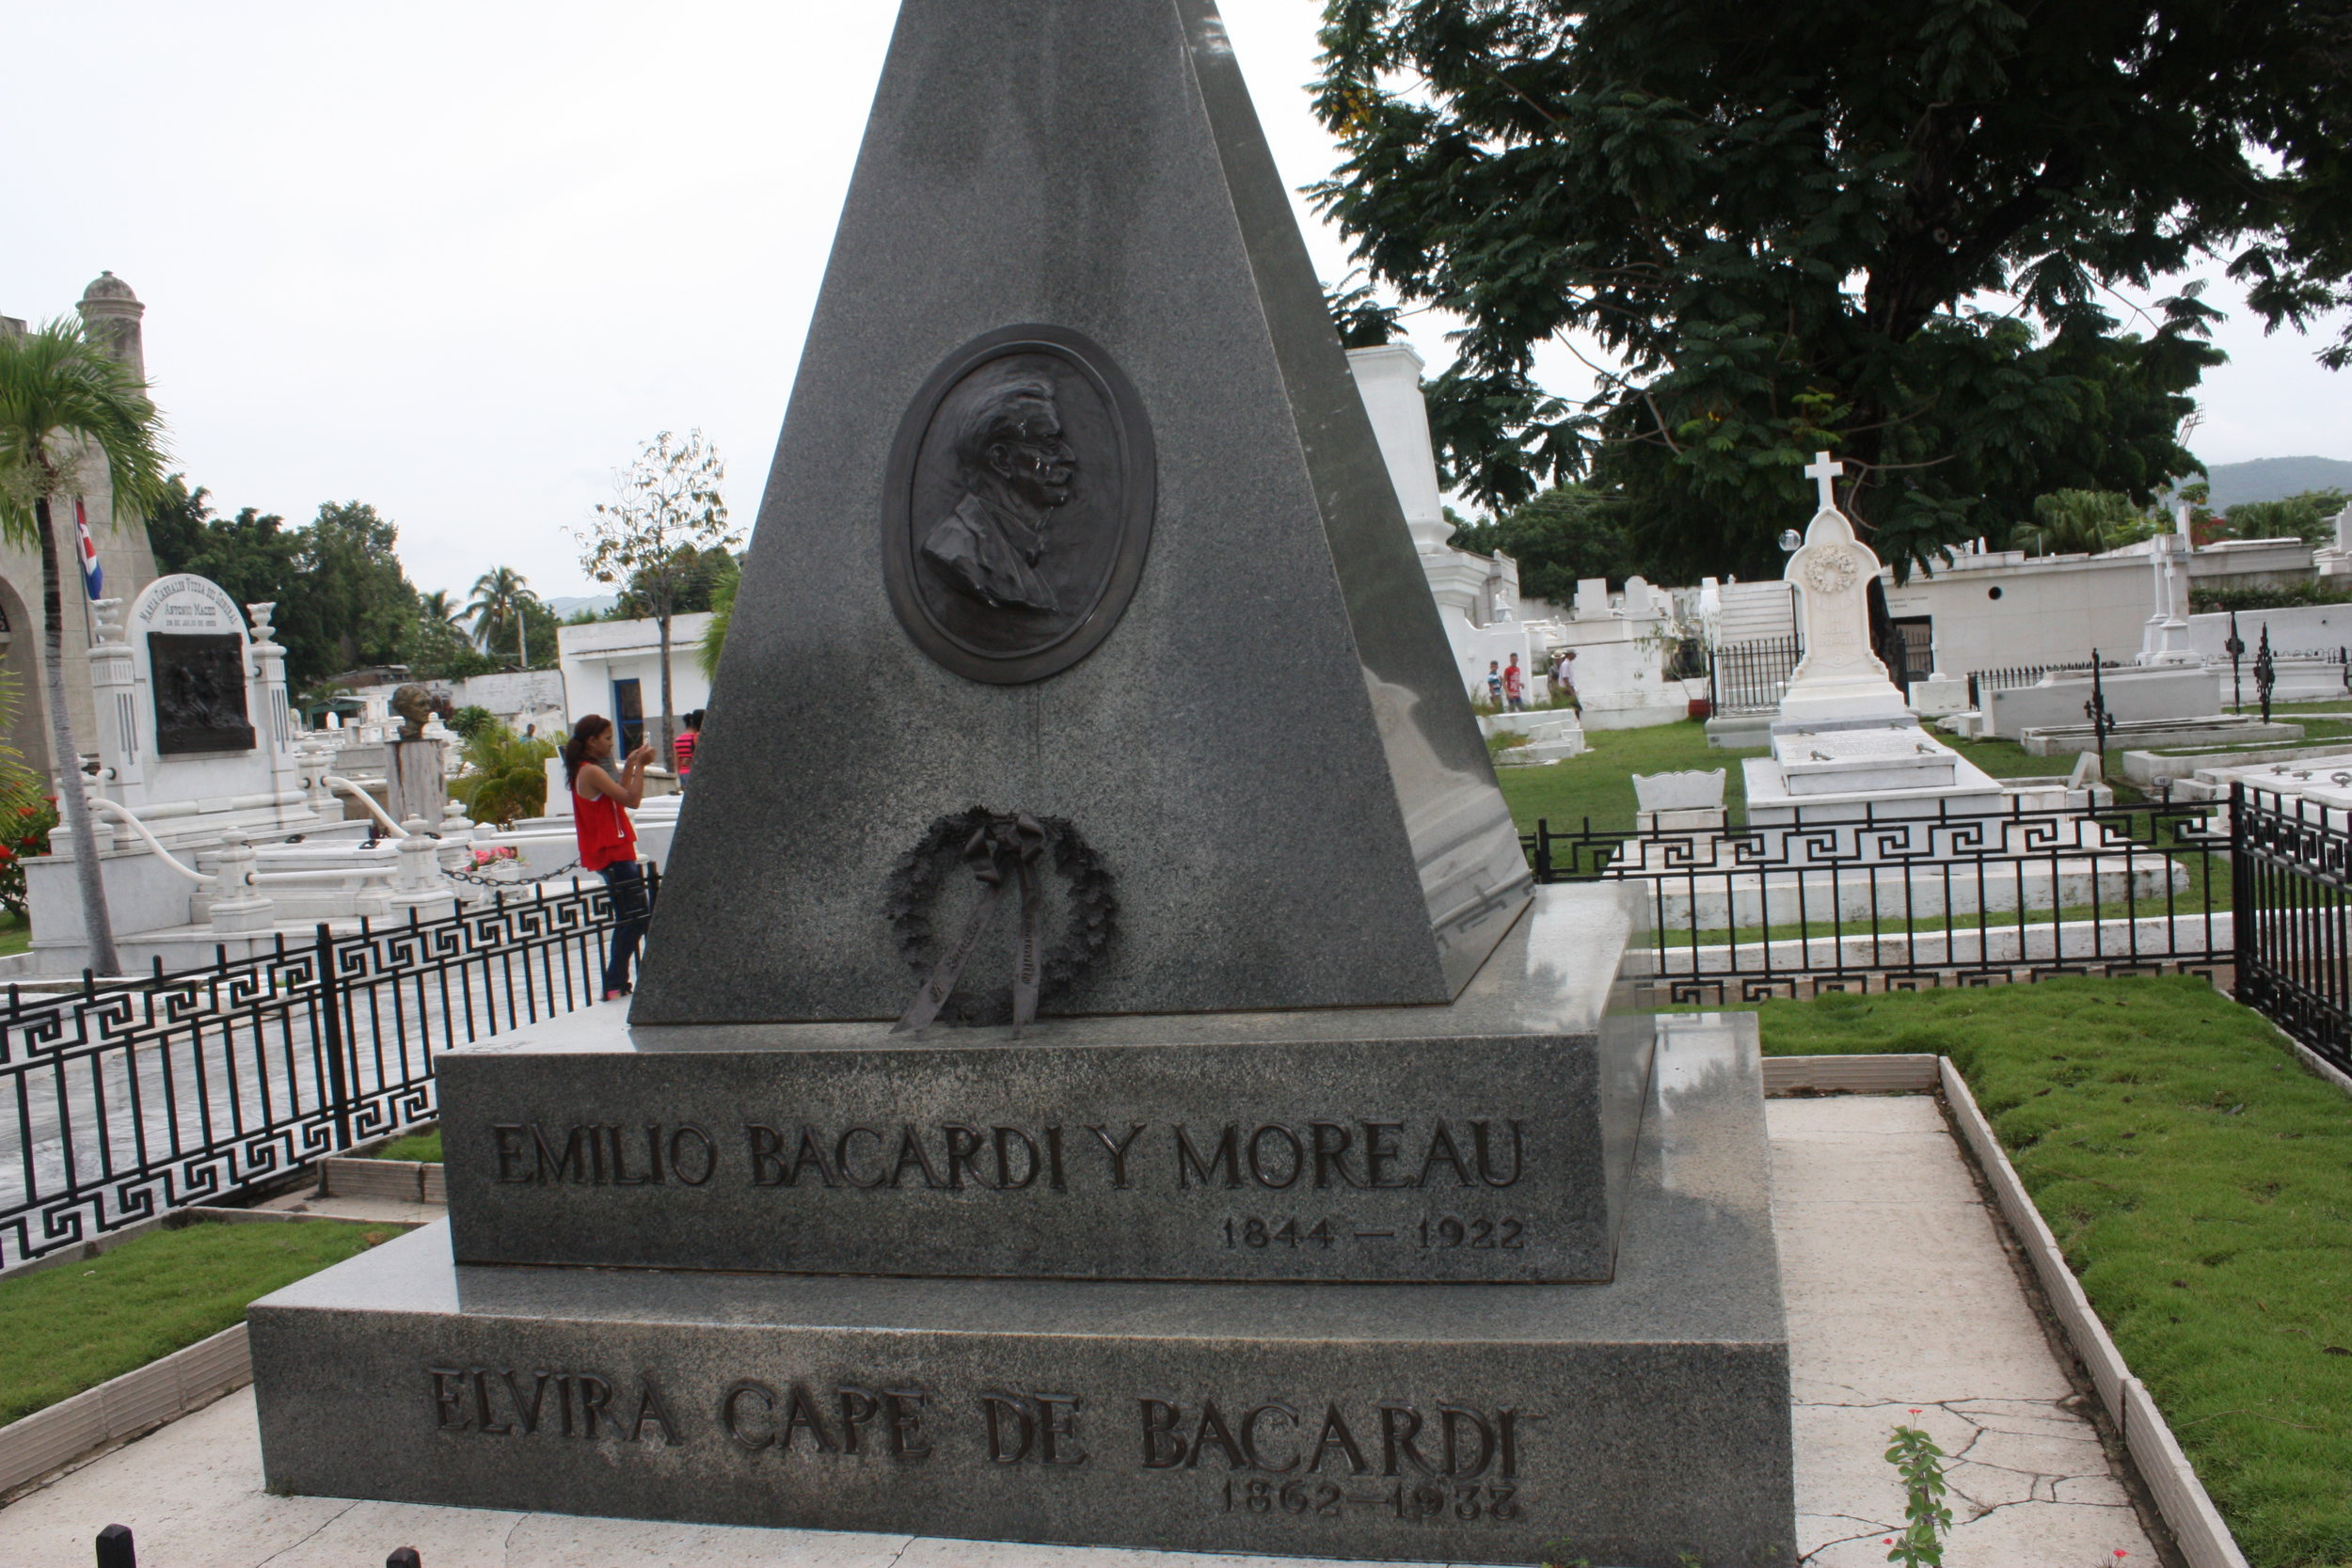 Santa Ifigenia Cemetery, Santiago, Cuba